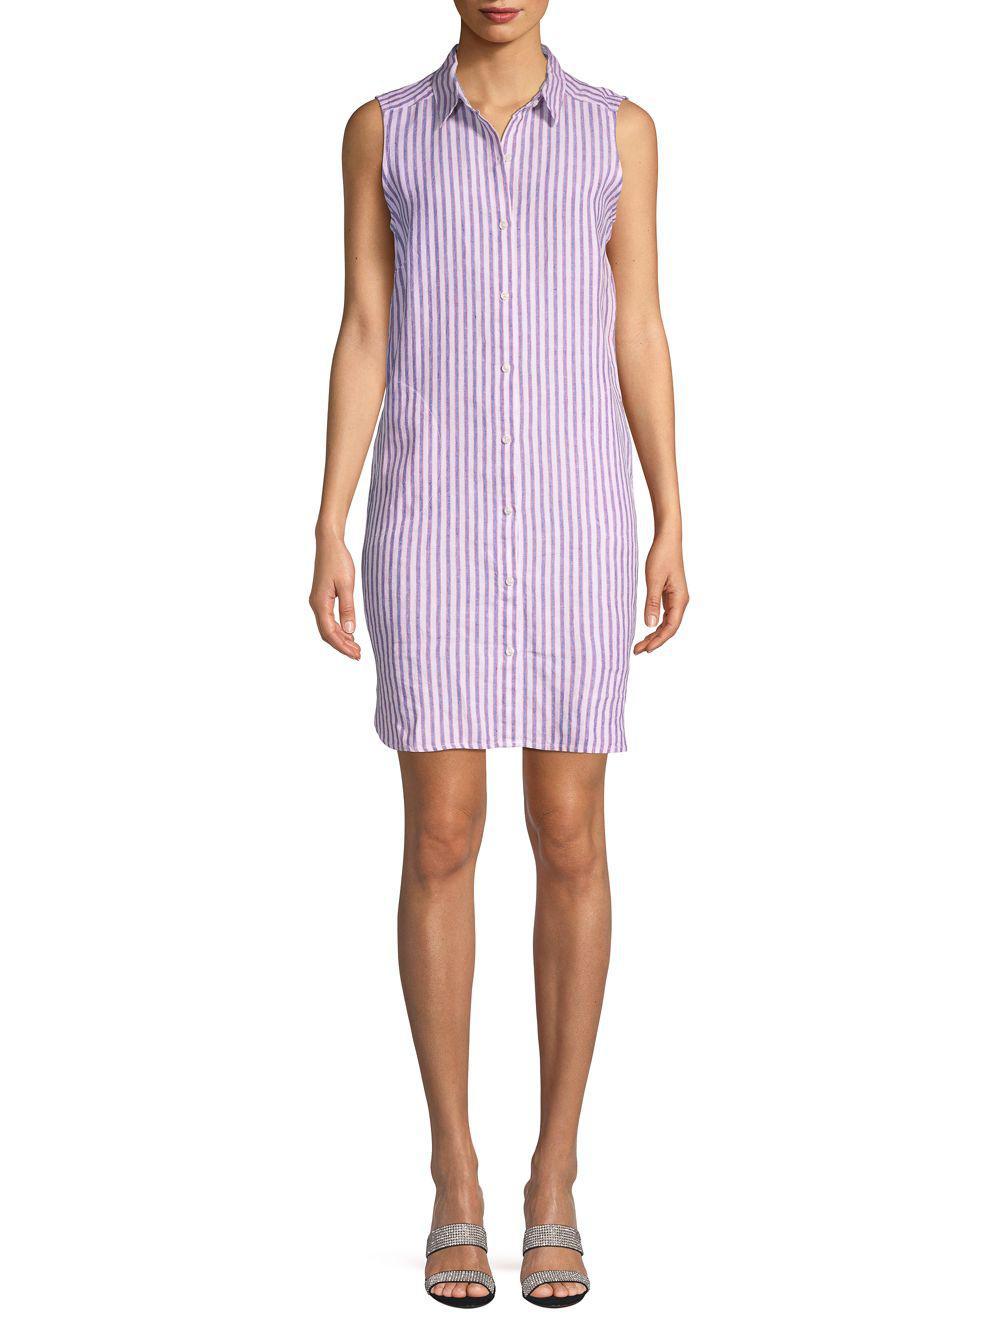 966a4072a68 Pure Navy Sleeveless Striped Linen Shirtdress in Purple - Lyst